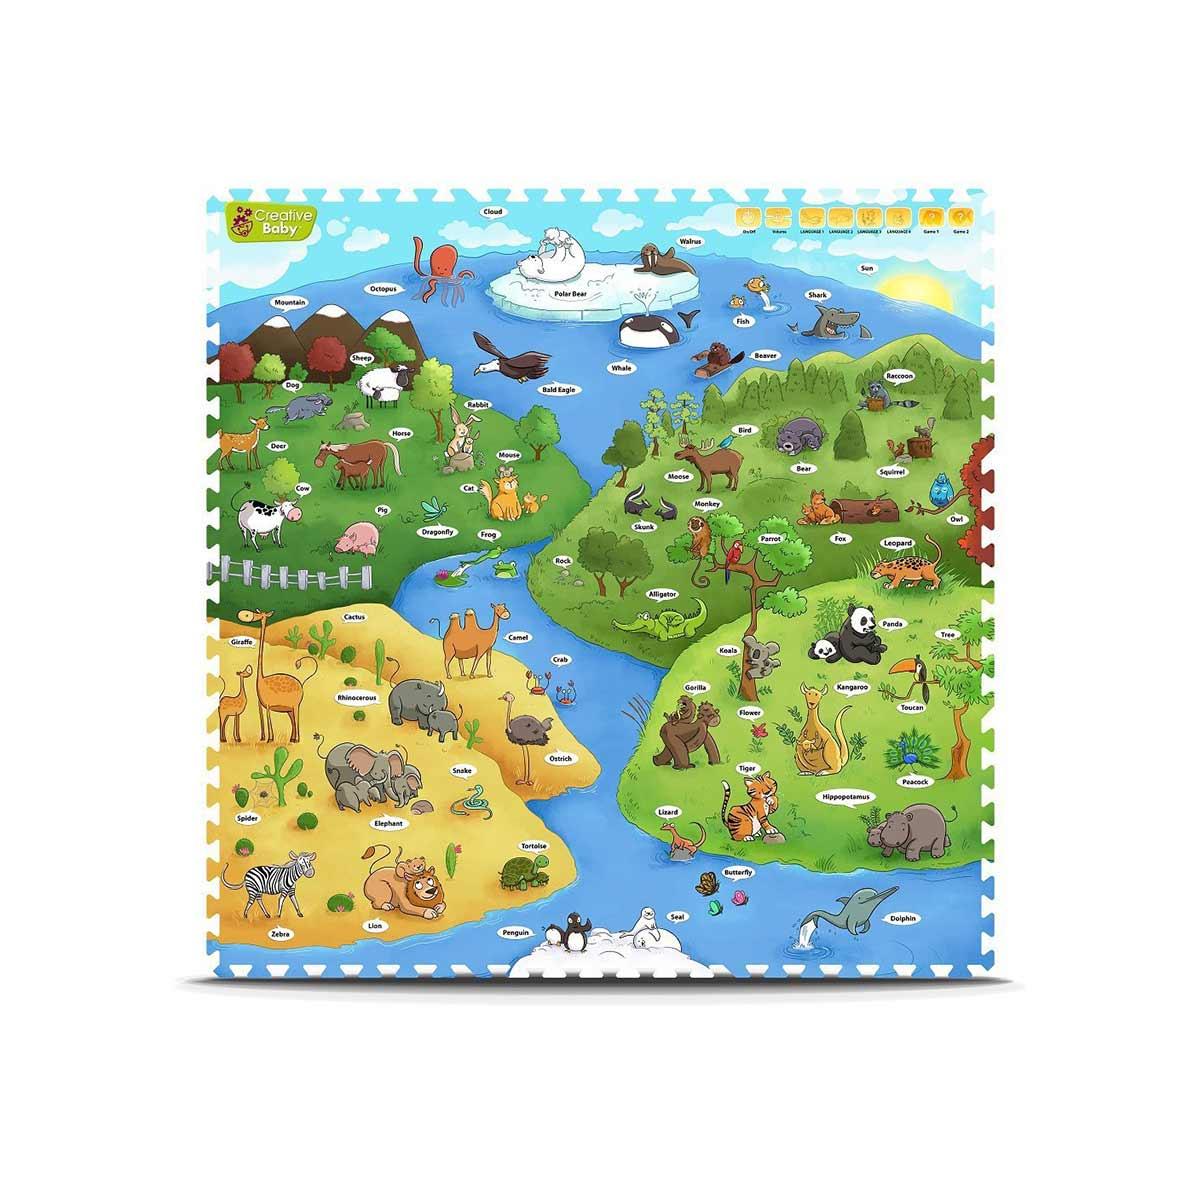 Creative Baby プレイマット ジョイントマット 動物 子供 幼児 インテリア 知育玩具 英語 おもちゃ